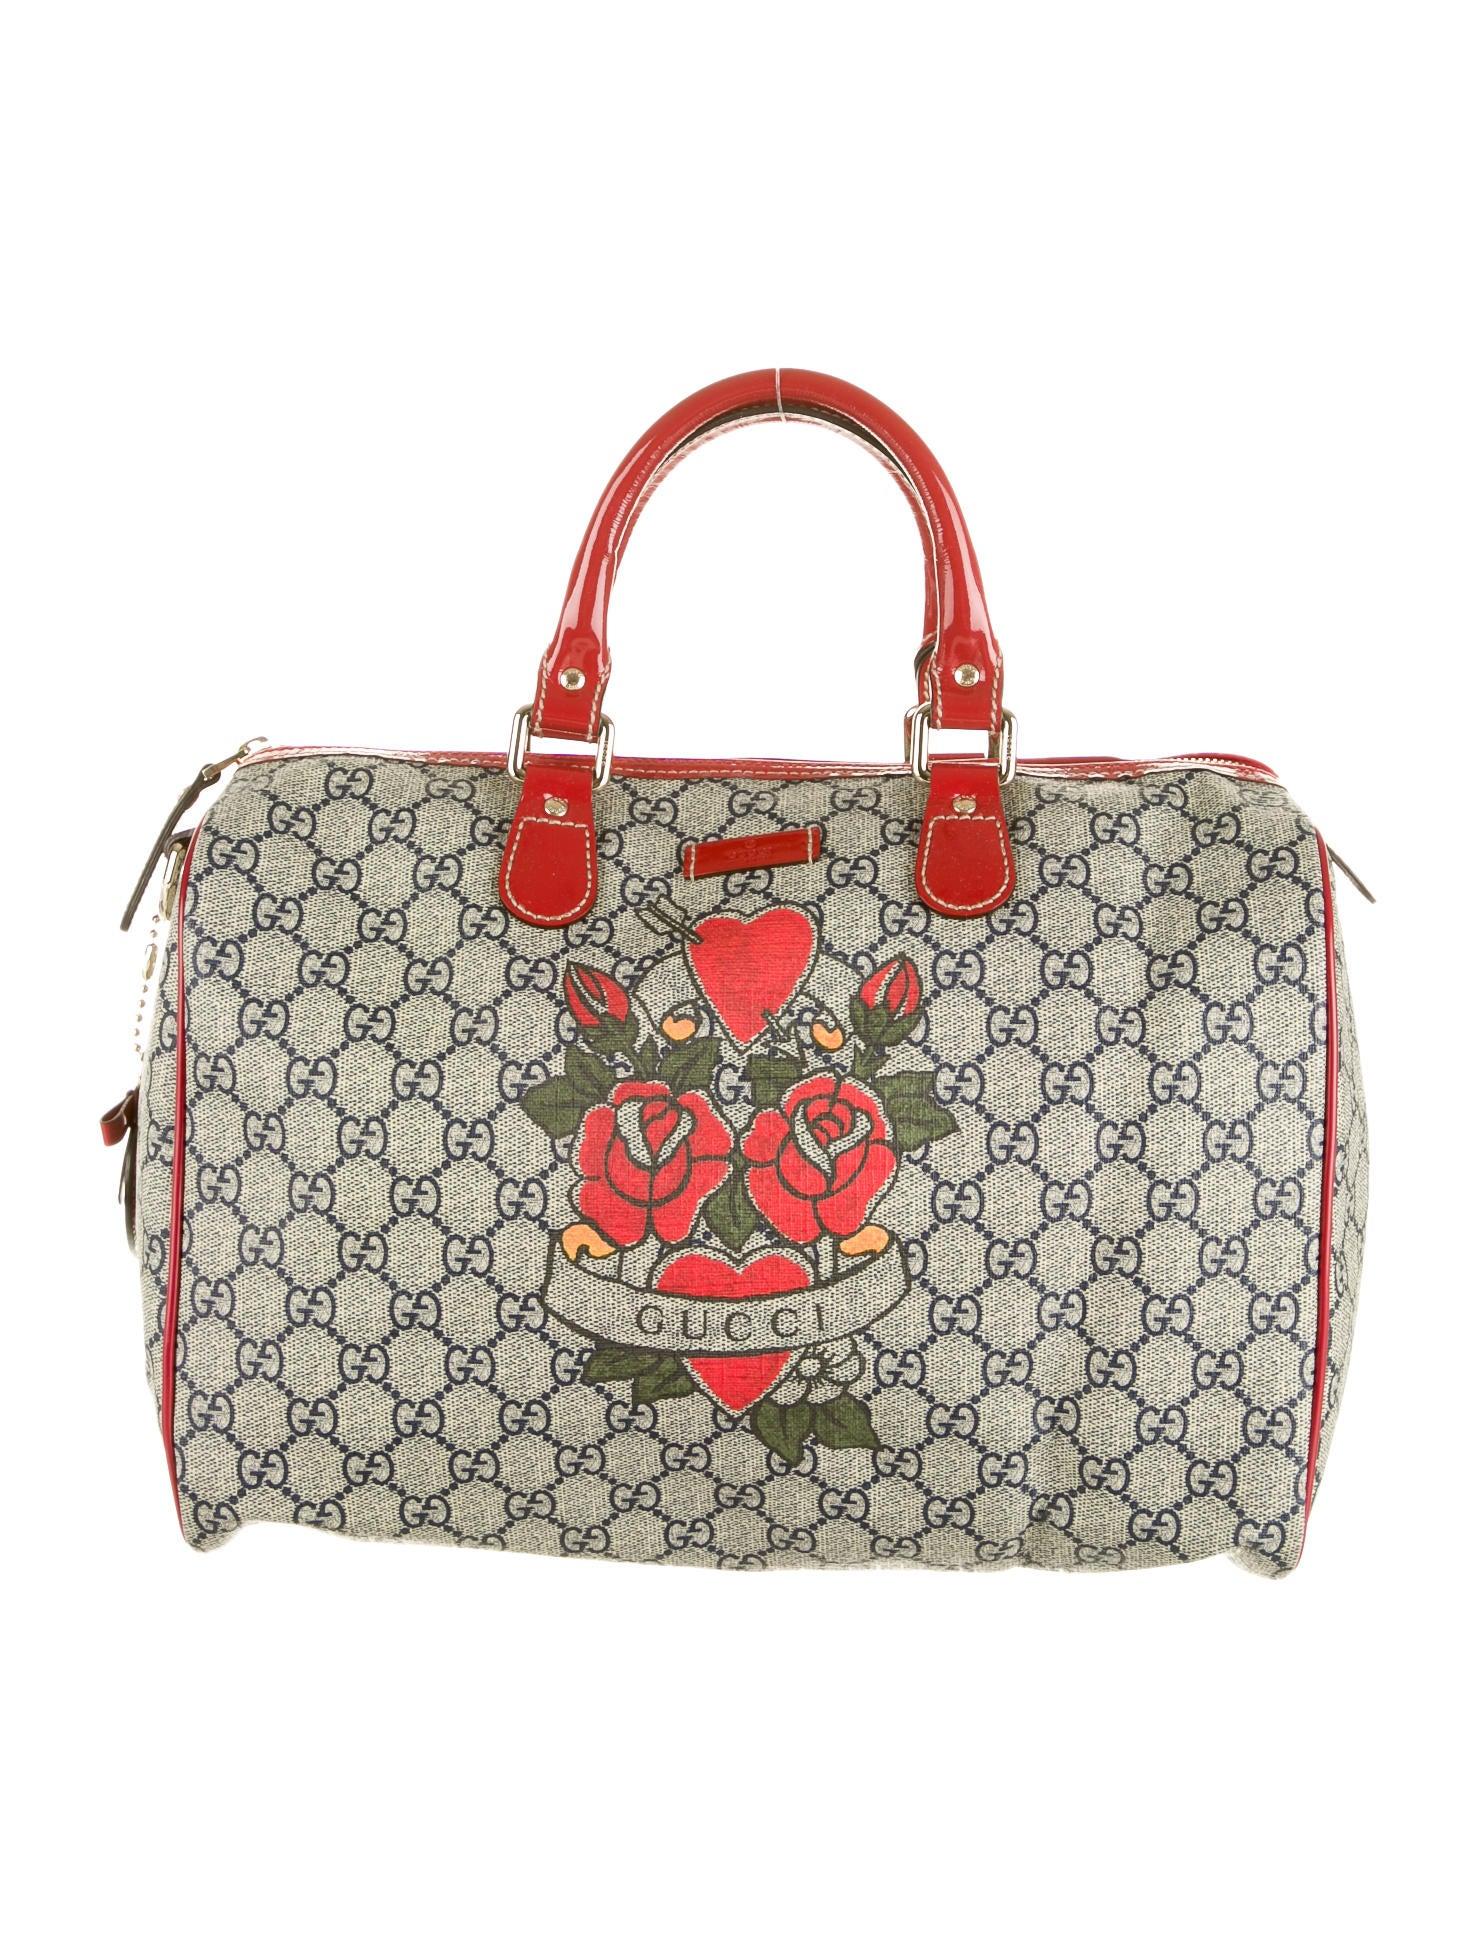 c579b0b155b8 Gucci Joy Boston Bag Tattoo | Stanford Center for Opportunity Policy ...